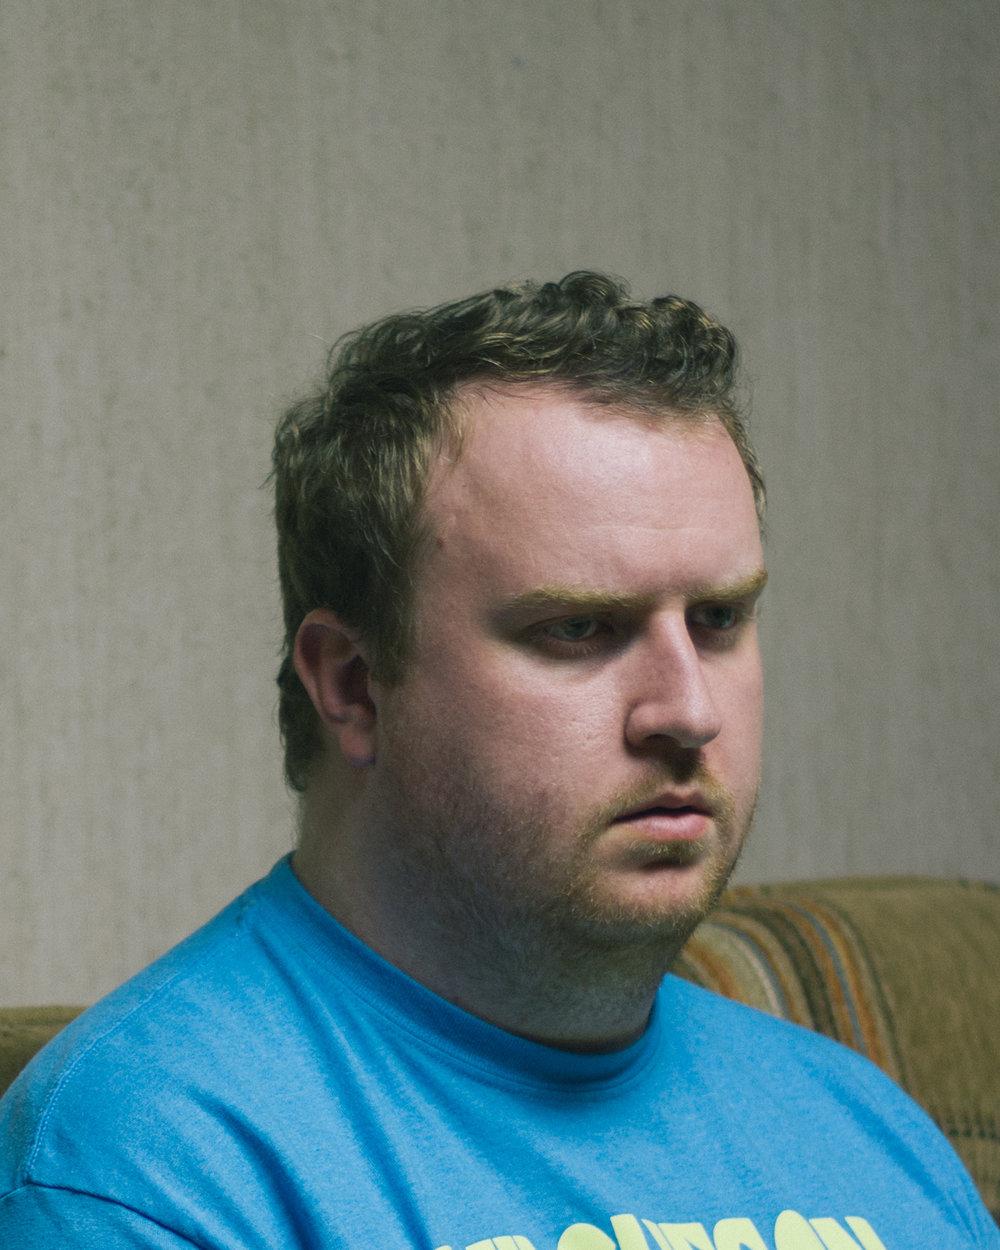 Self-portrait by Sean Johnson